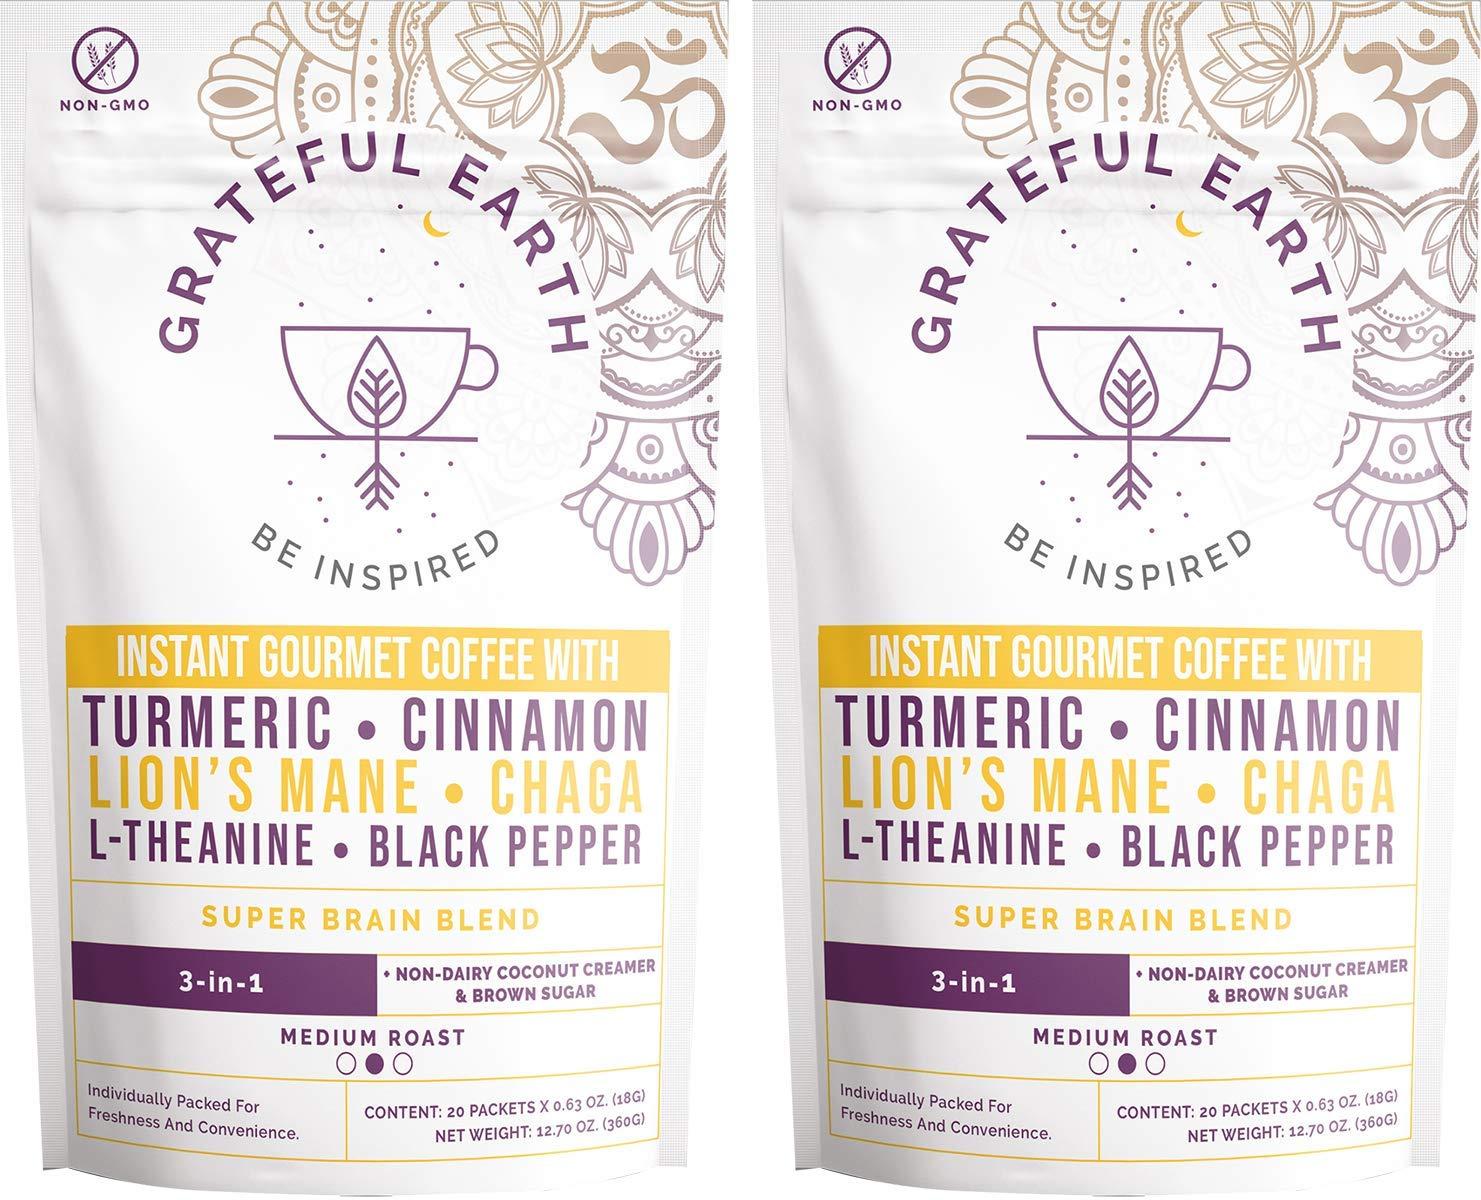 Grateful Earth: Tampa Mall Super Brain Alternative dealer Blend 3-in-1 Gourmet Instant Coffee